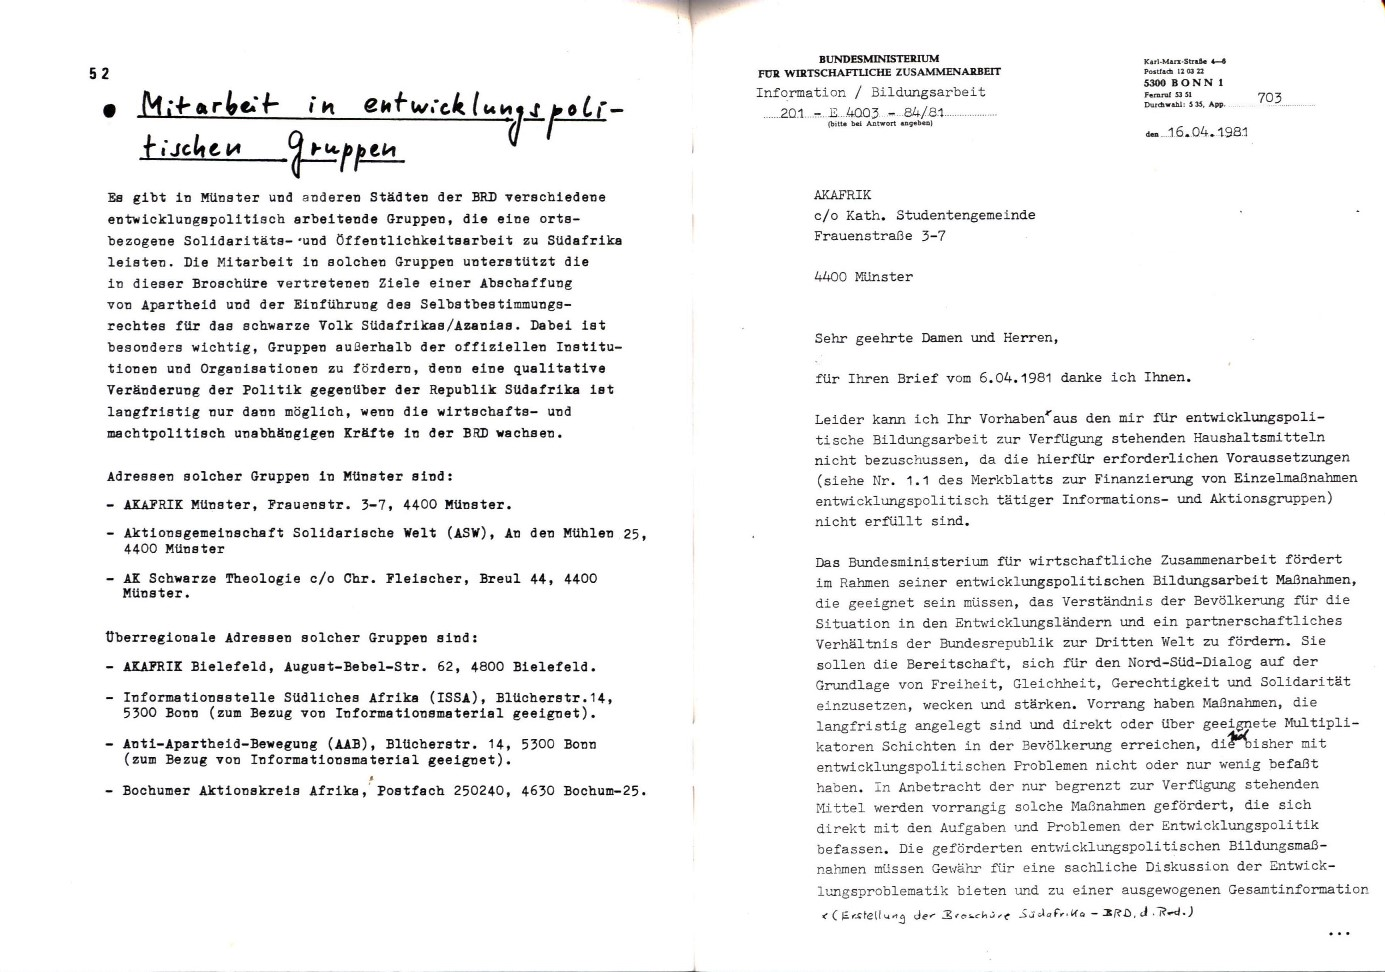 Muenster_AKAFRIK_1981_Suedafrika_BRD_28